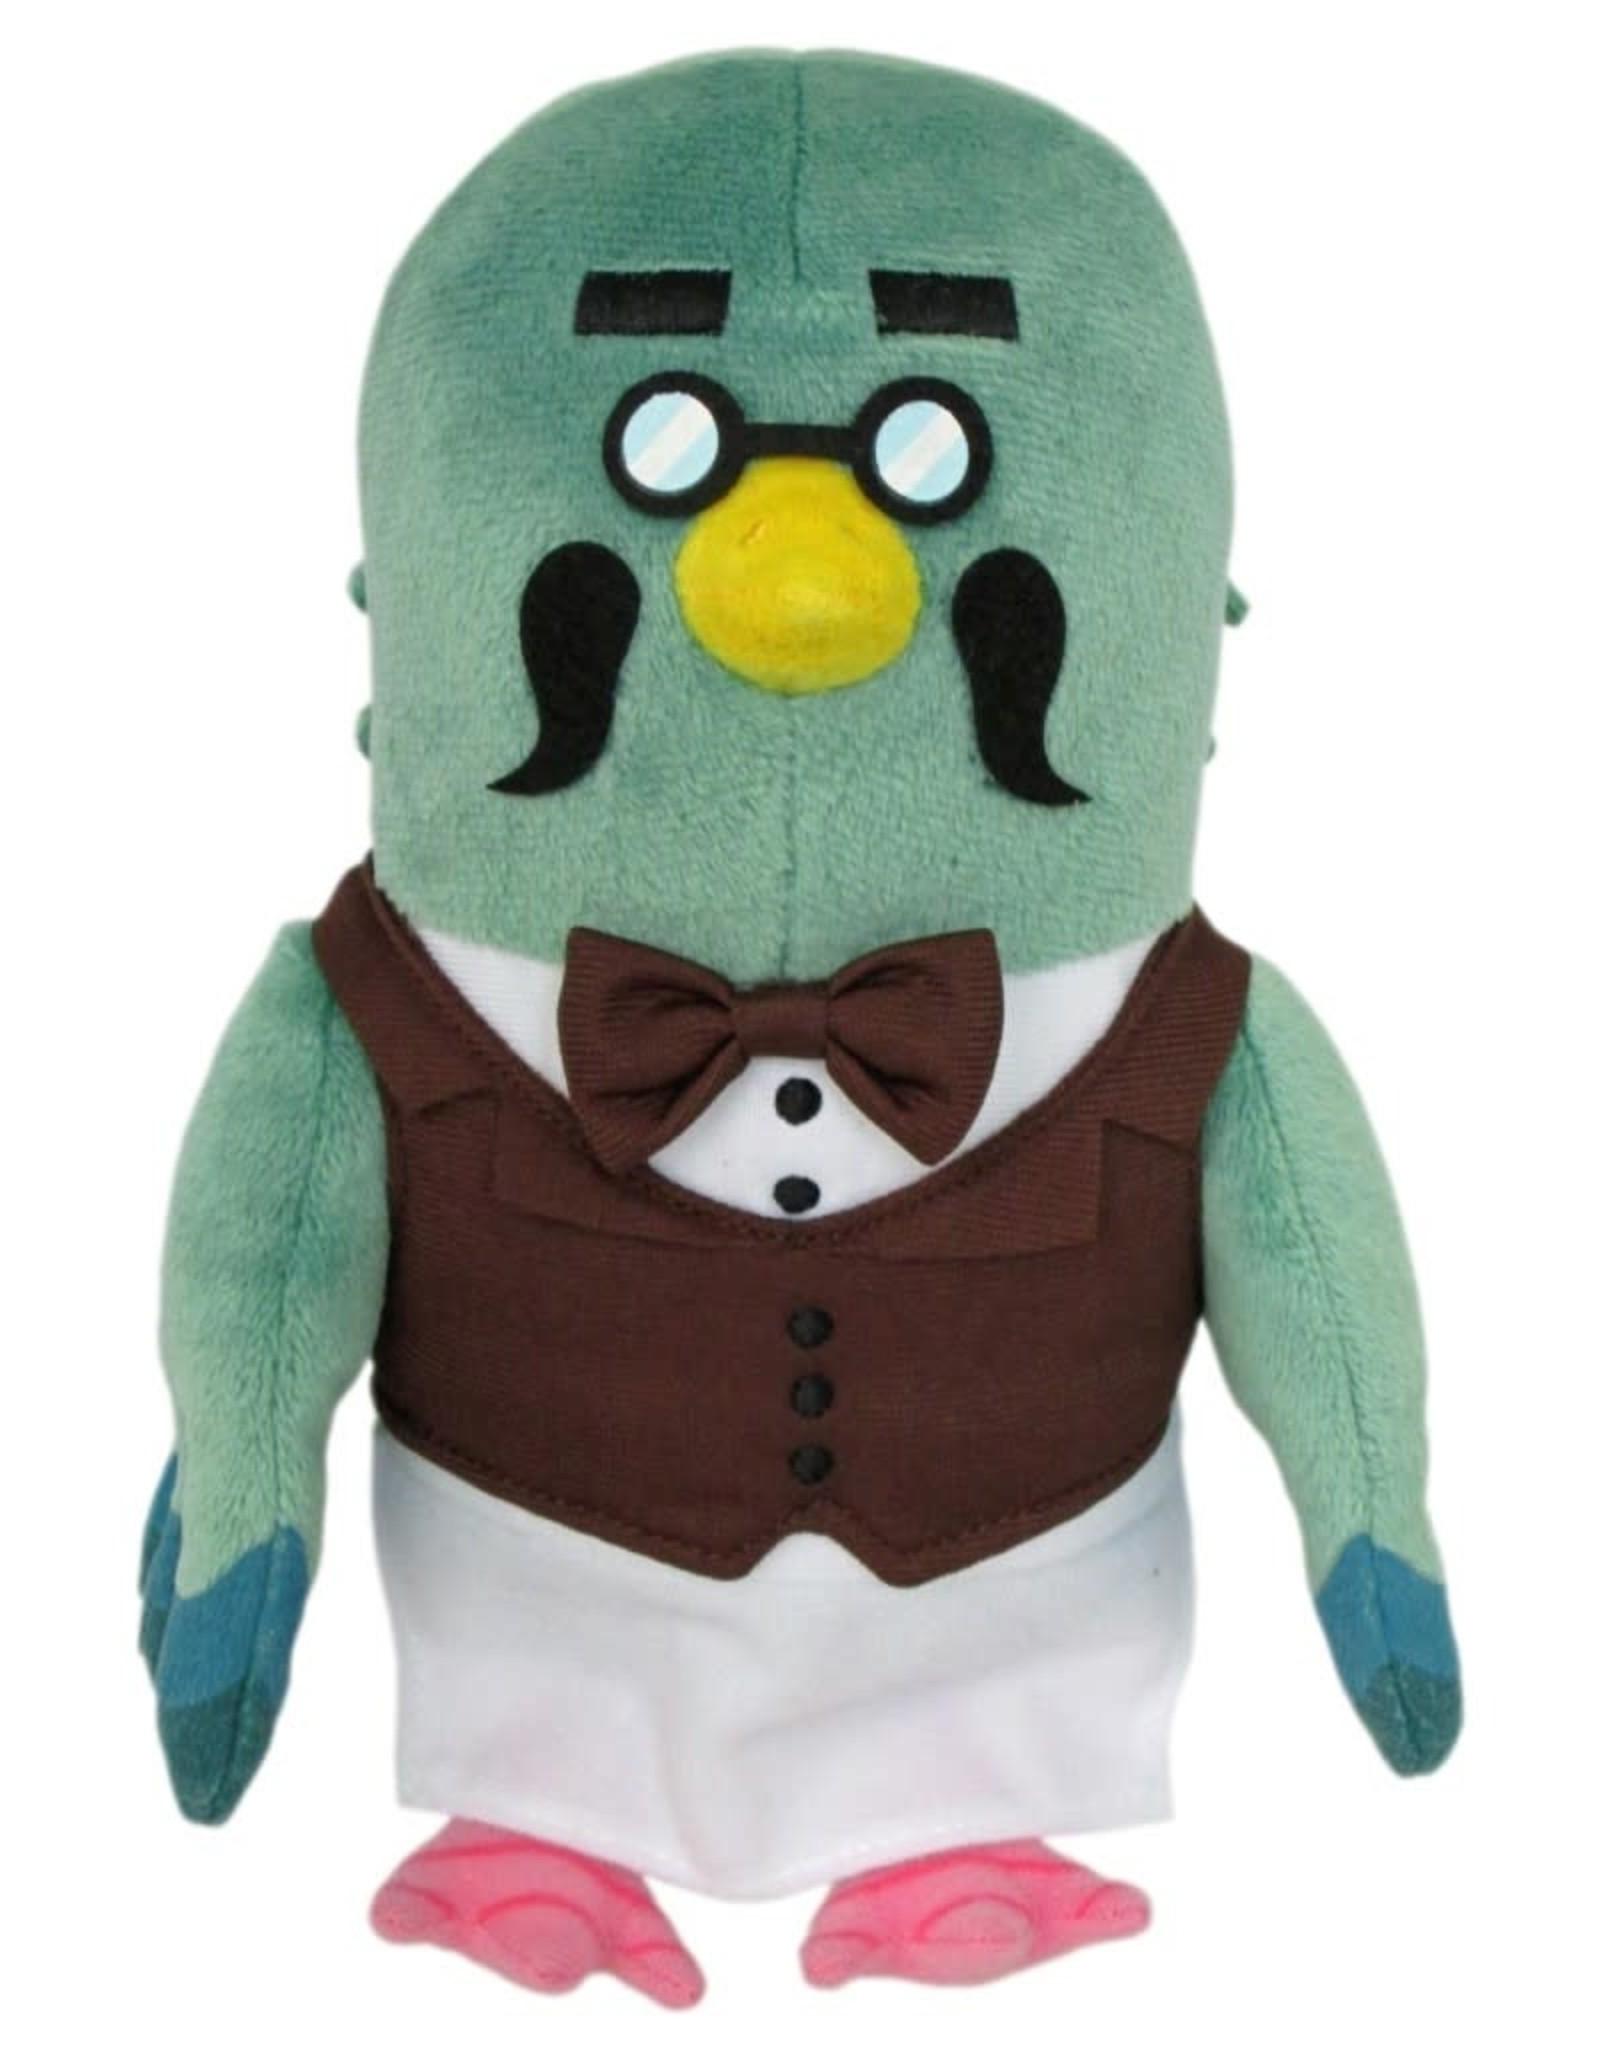 Animal Crossing Plushie - Brewster - 18cm